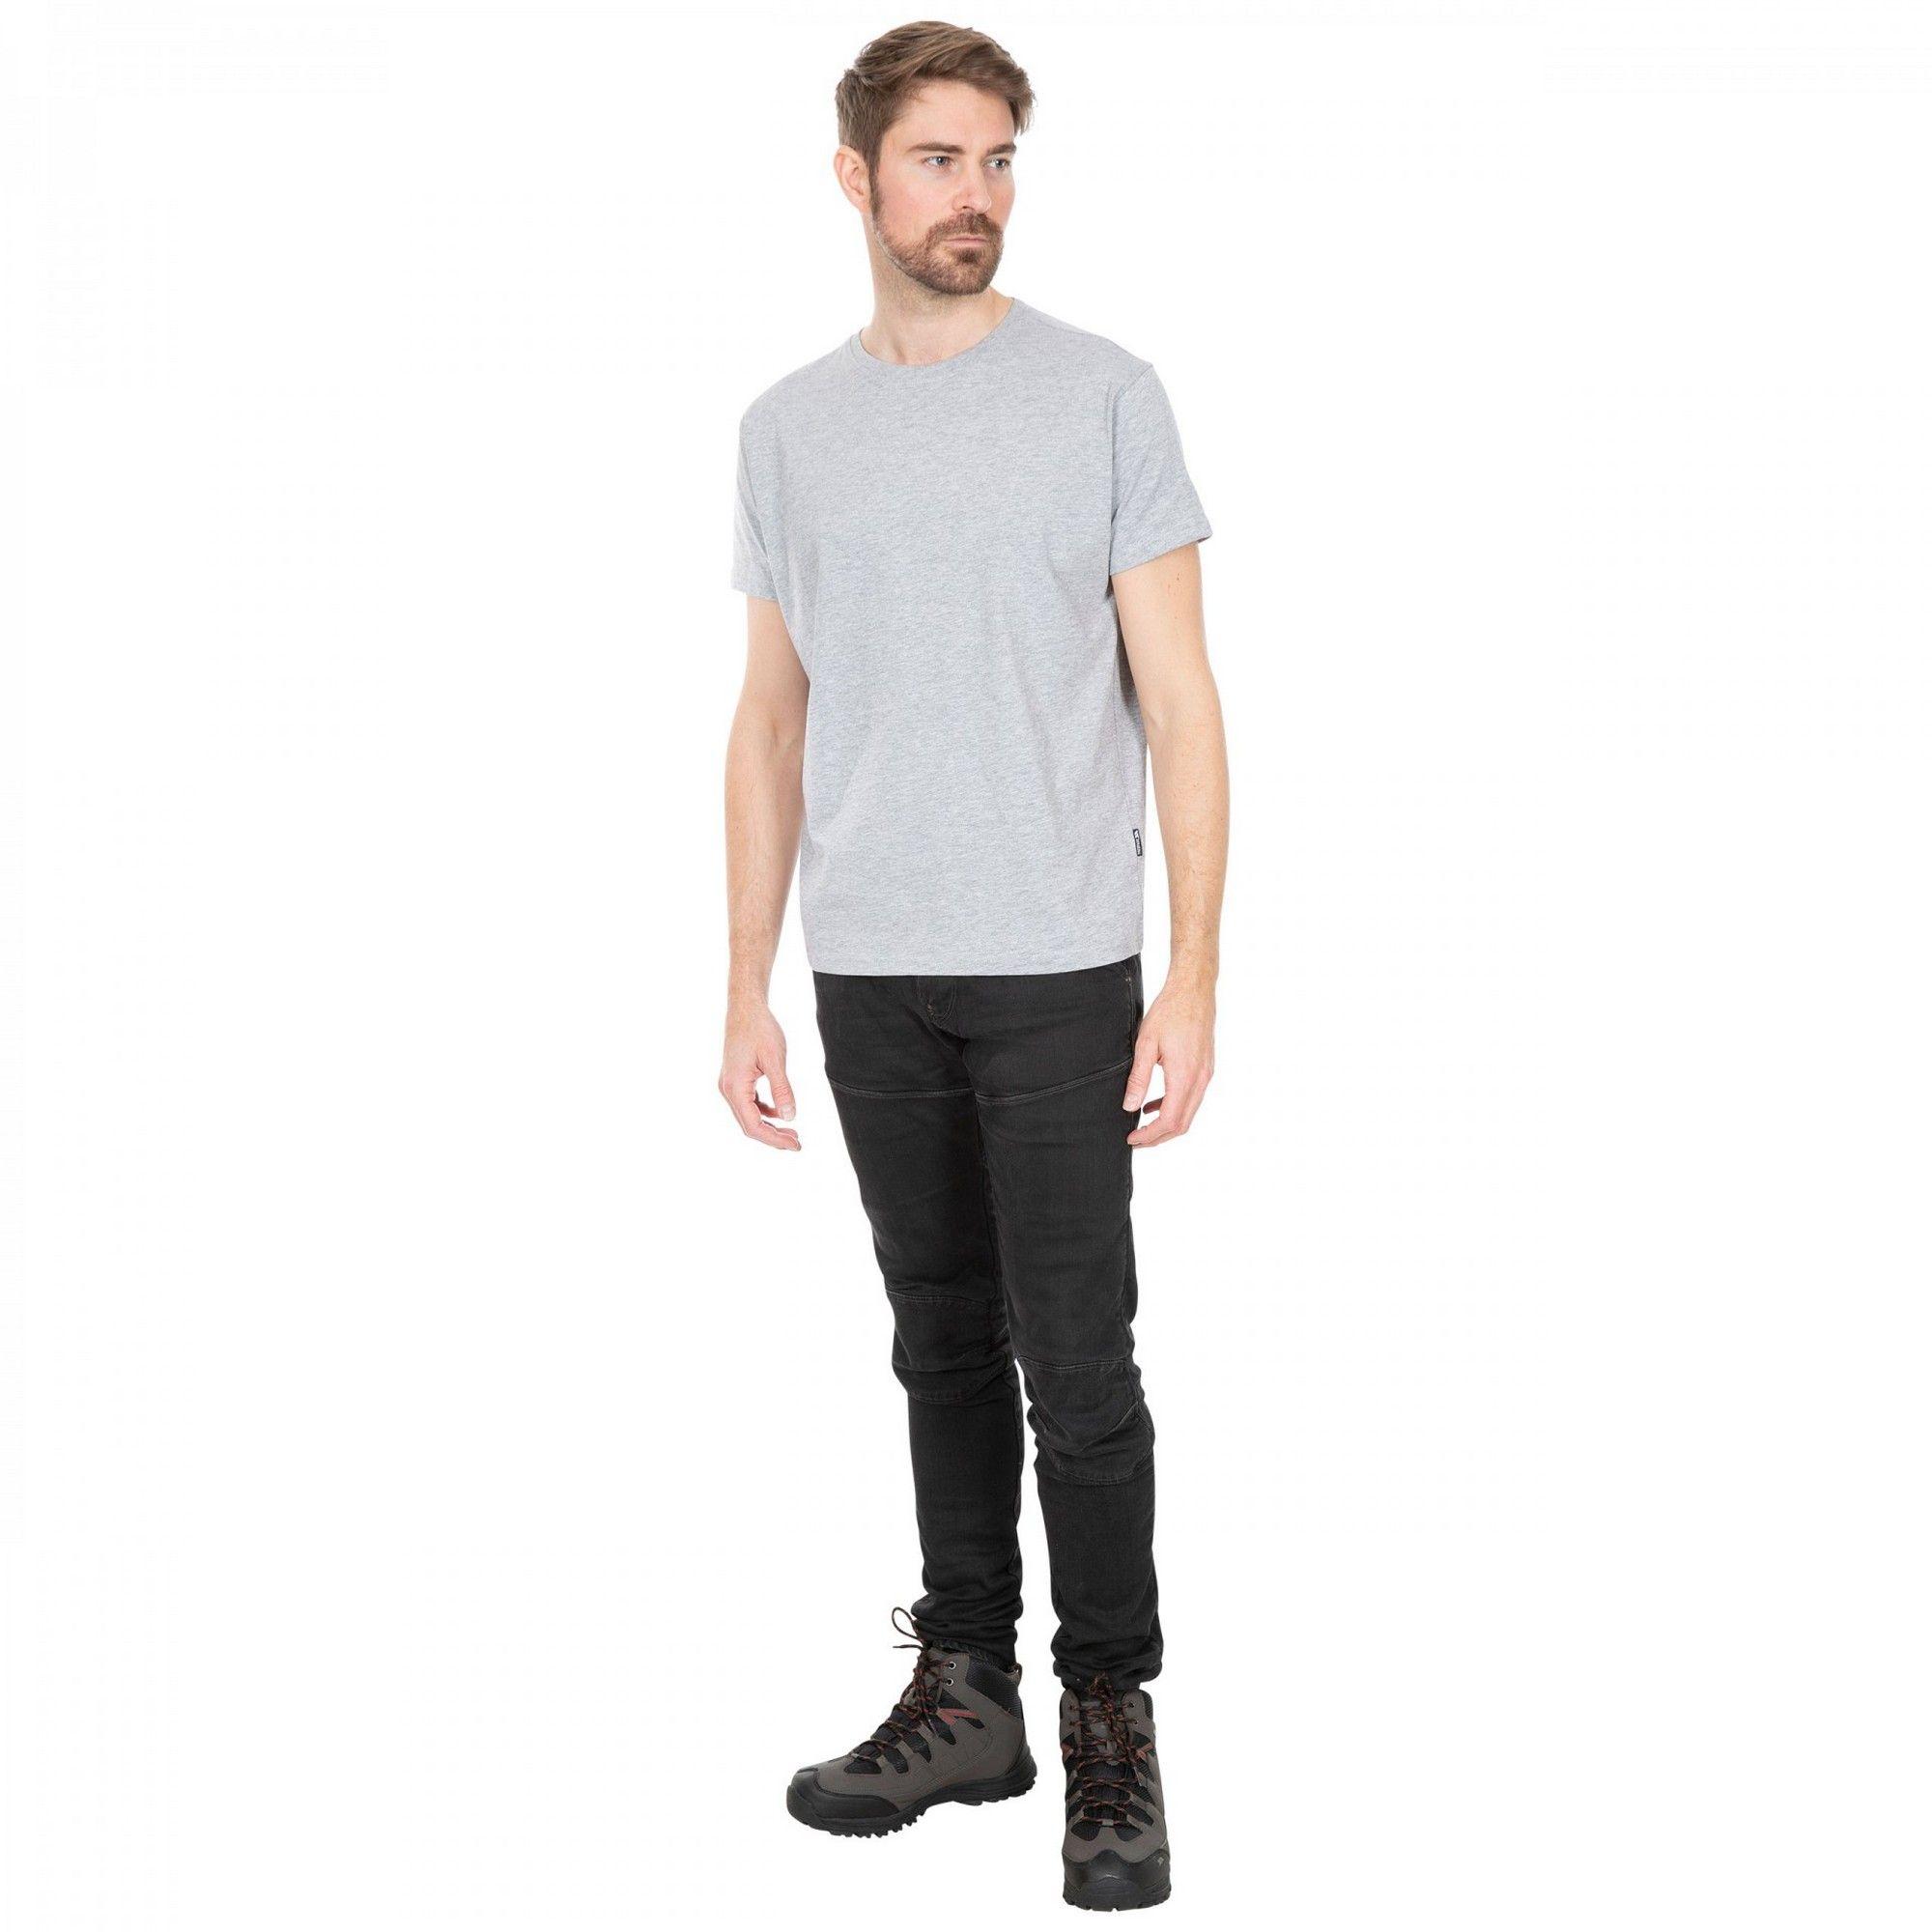 Trespass Mens Plaintee Quick Dry T Shirt